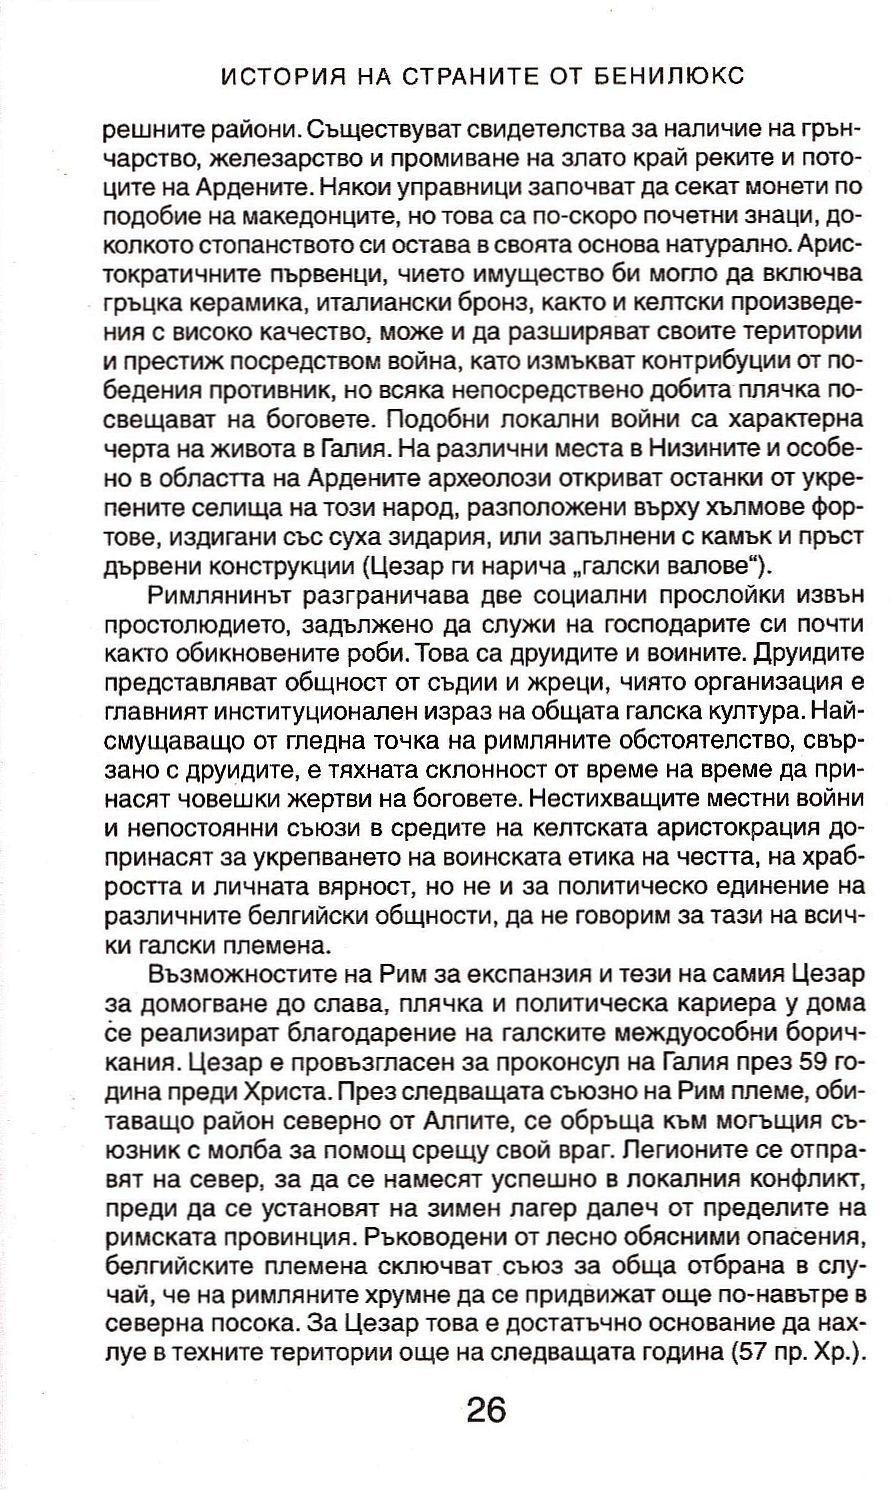 istorija-na-stranite-ot-beniljuks-6 - 7